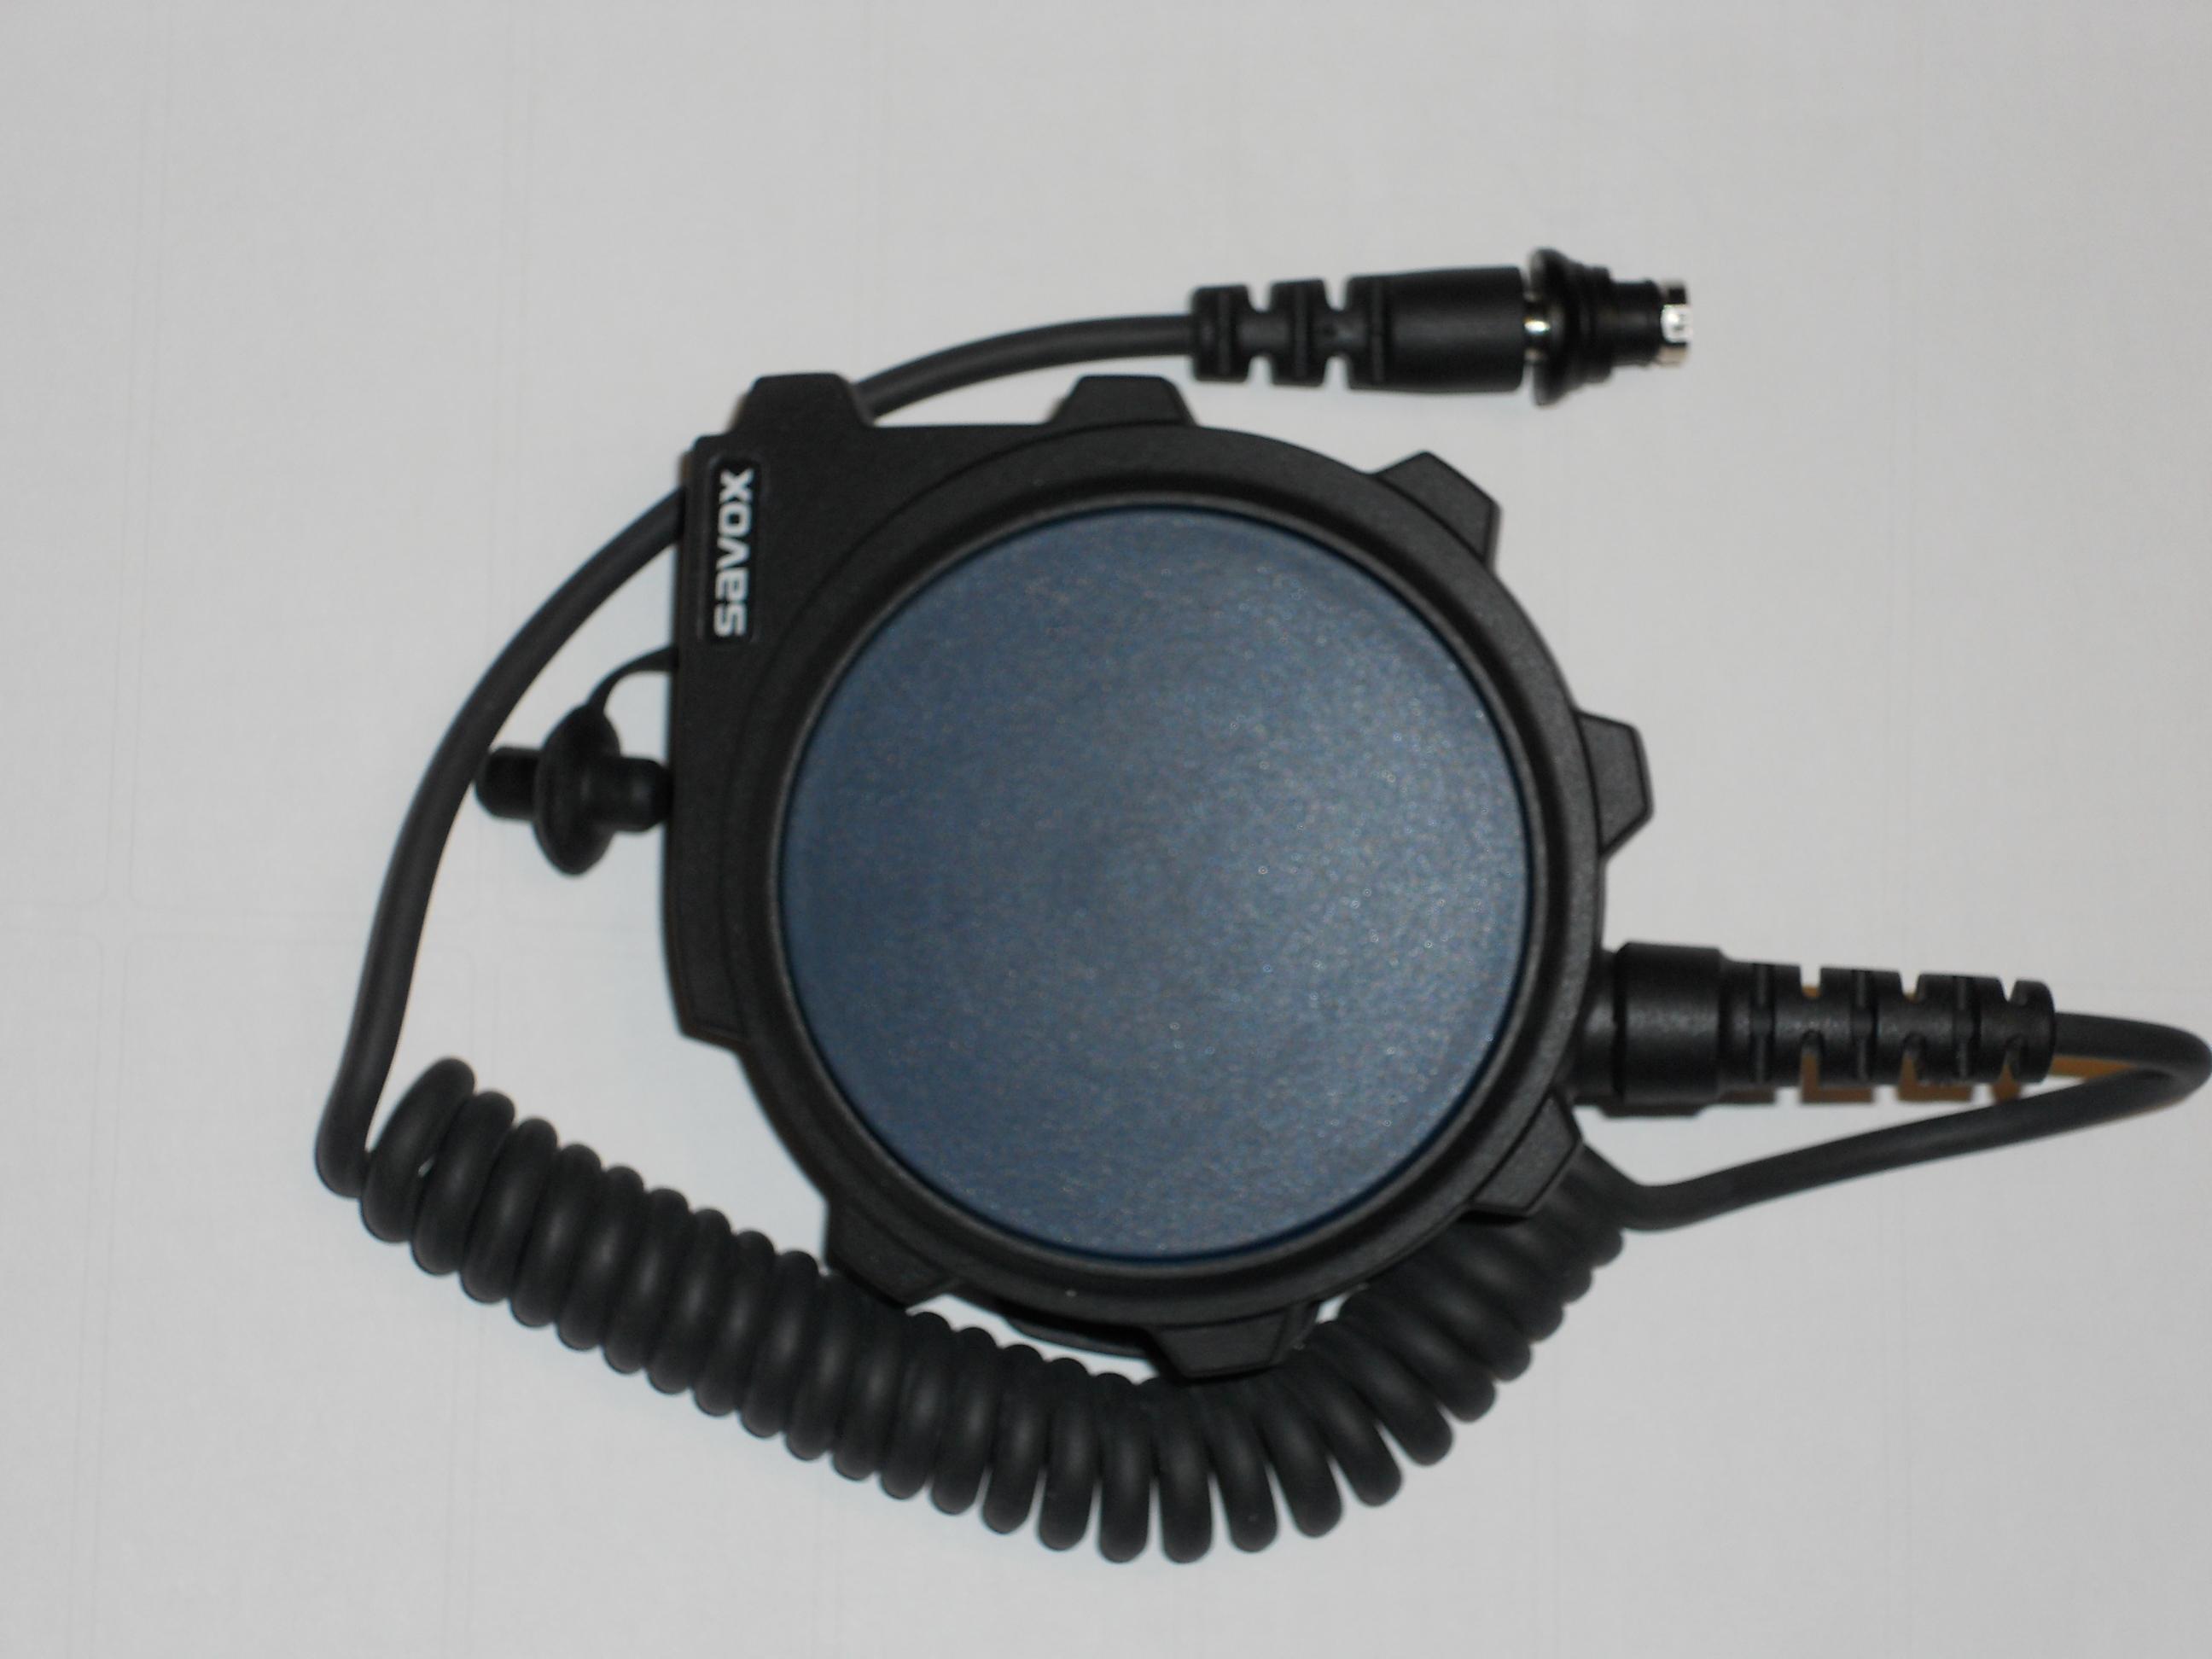 KENWOOD MC 60 A bordmikrofon Mikrofoner for CB radio og